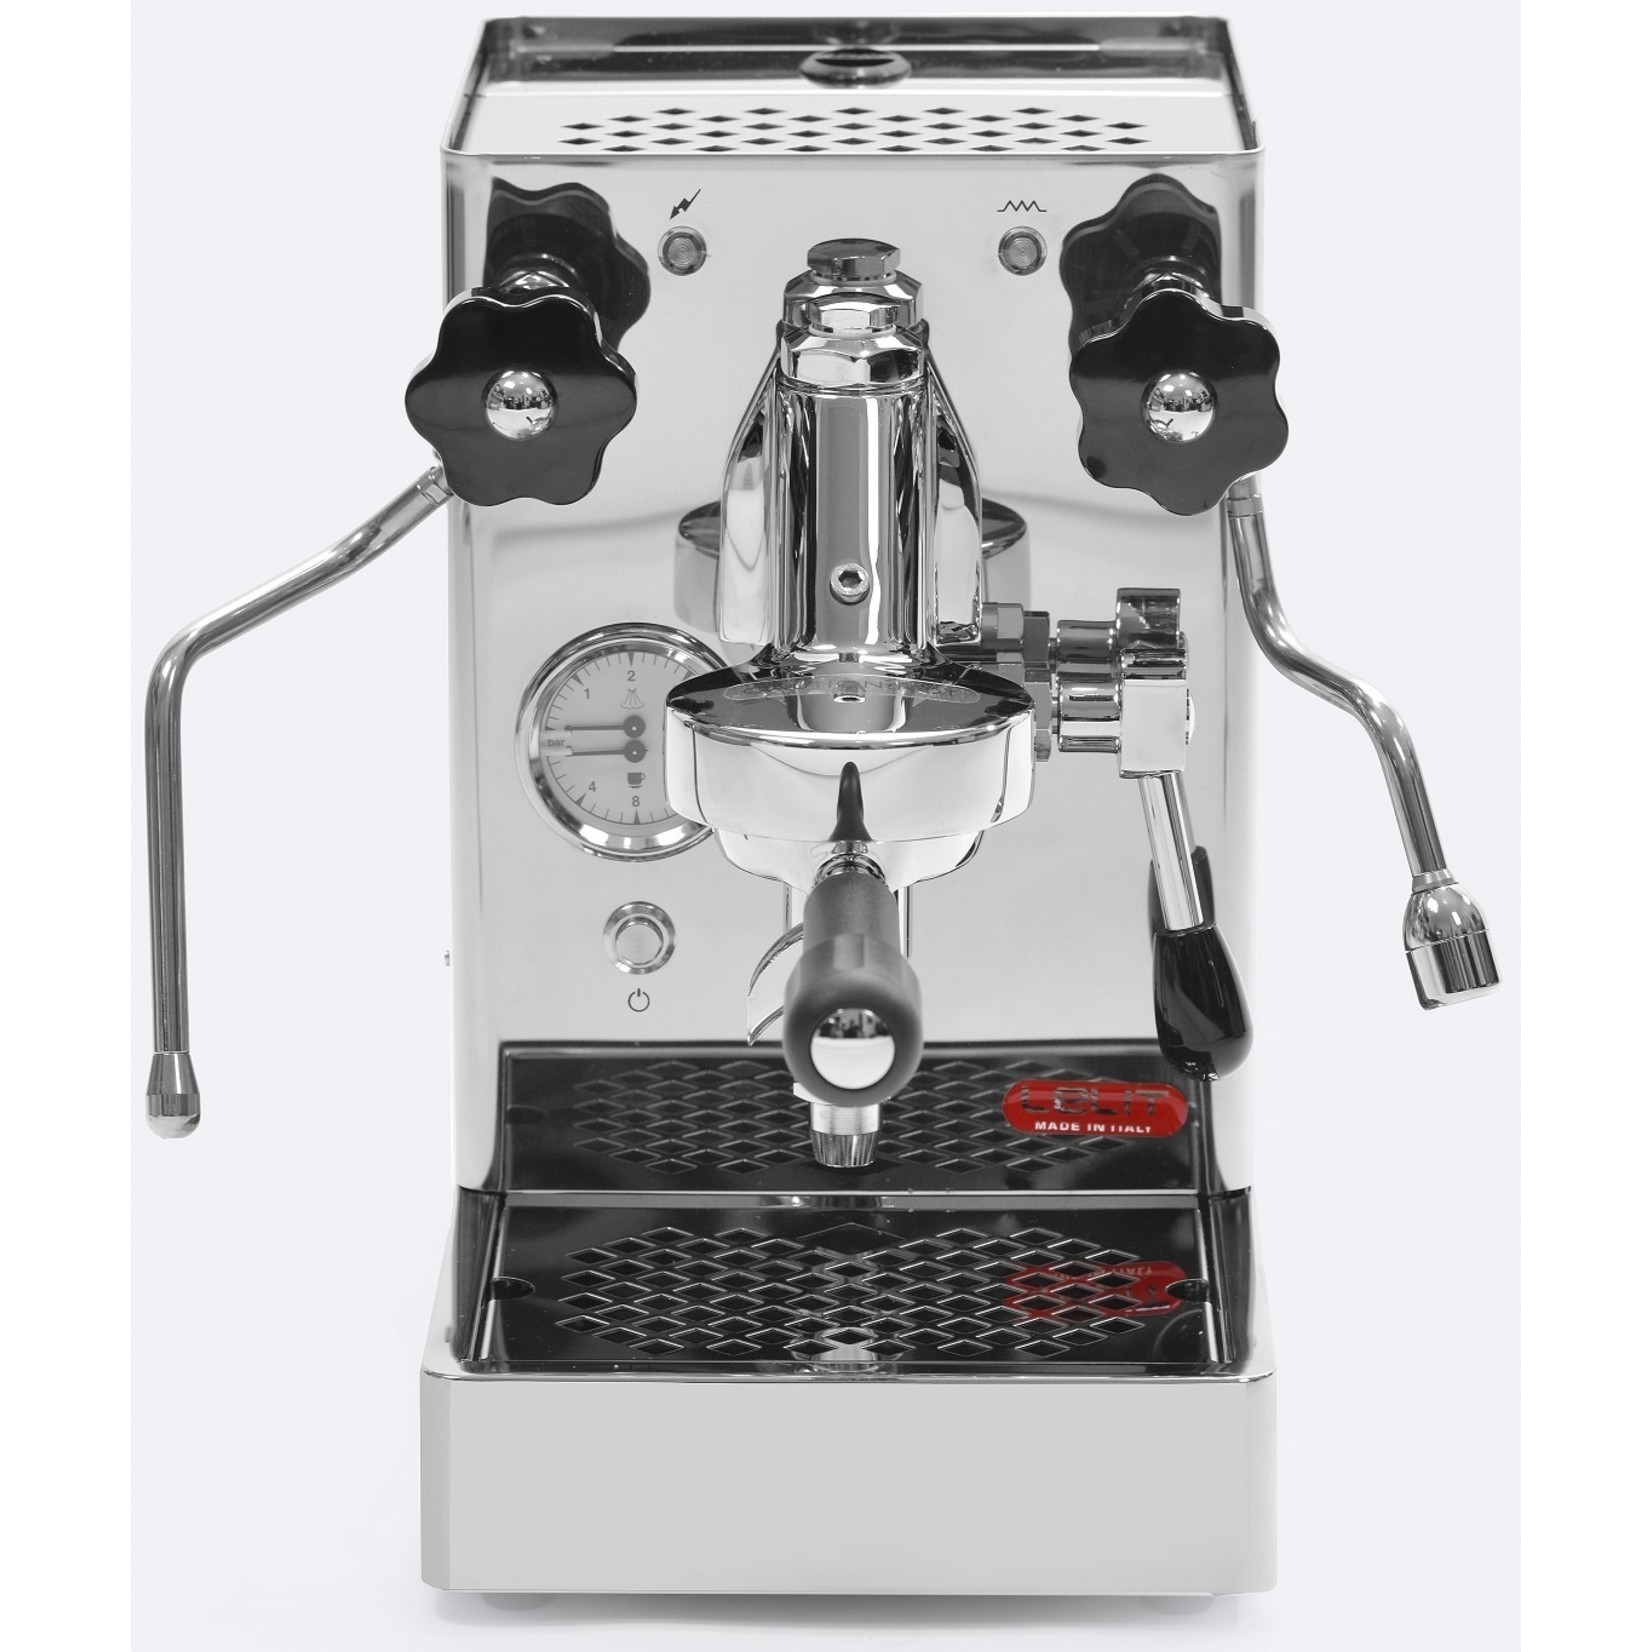 Lelit Lelit espressomachine PL62 Mara